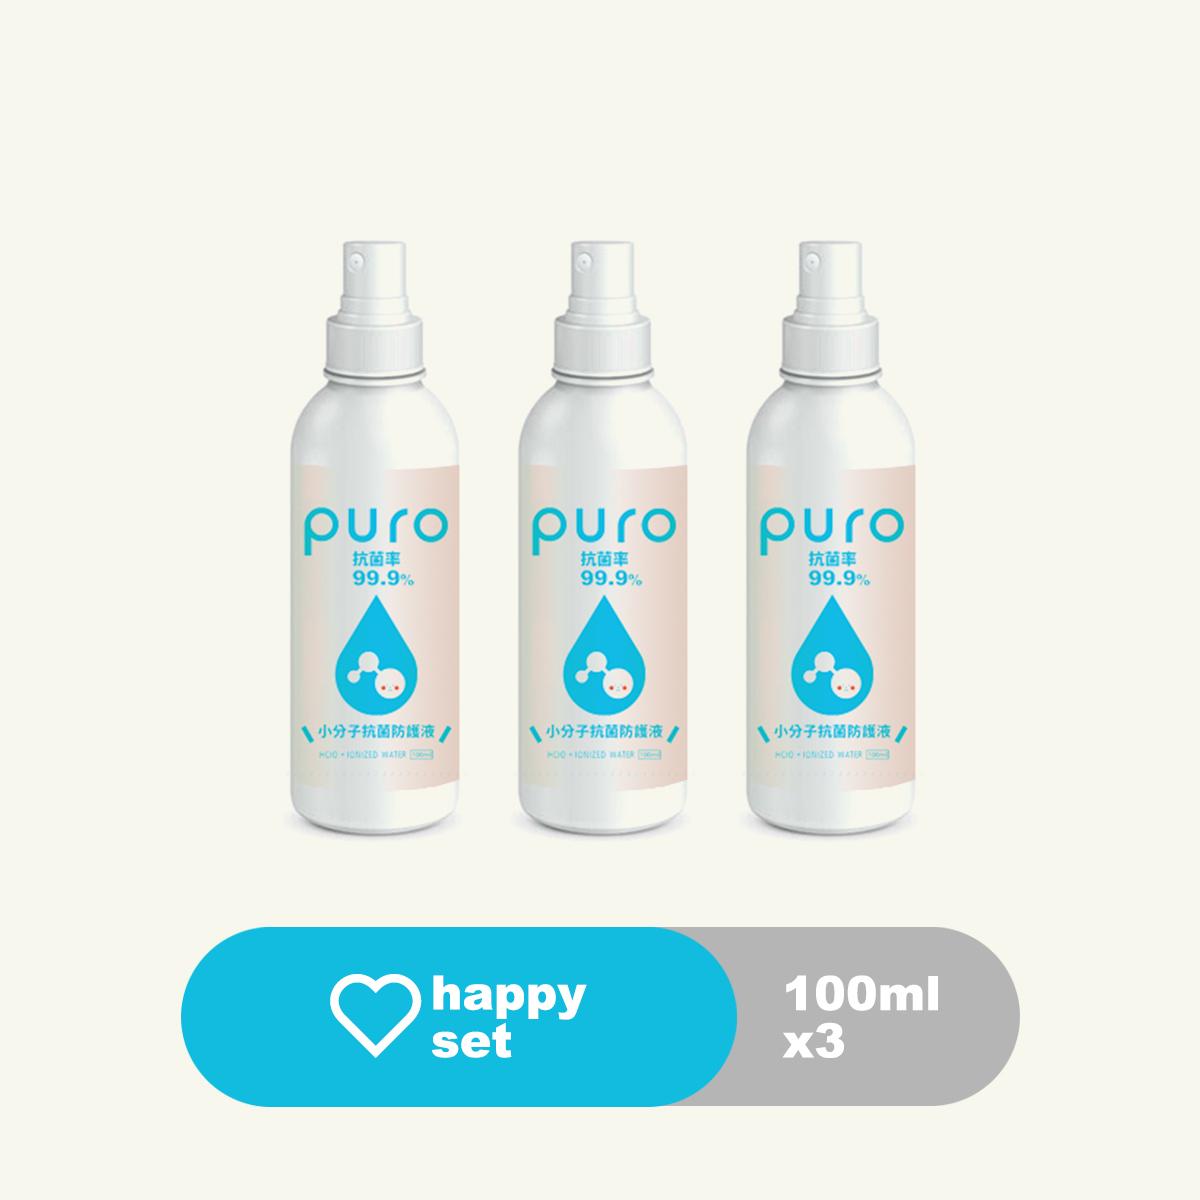 PURO2.0x3-20200227.jpg